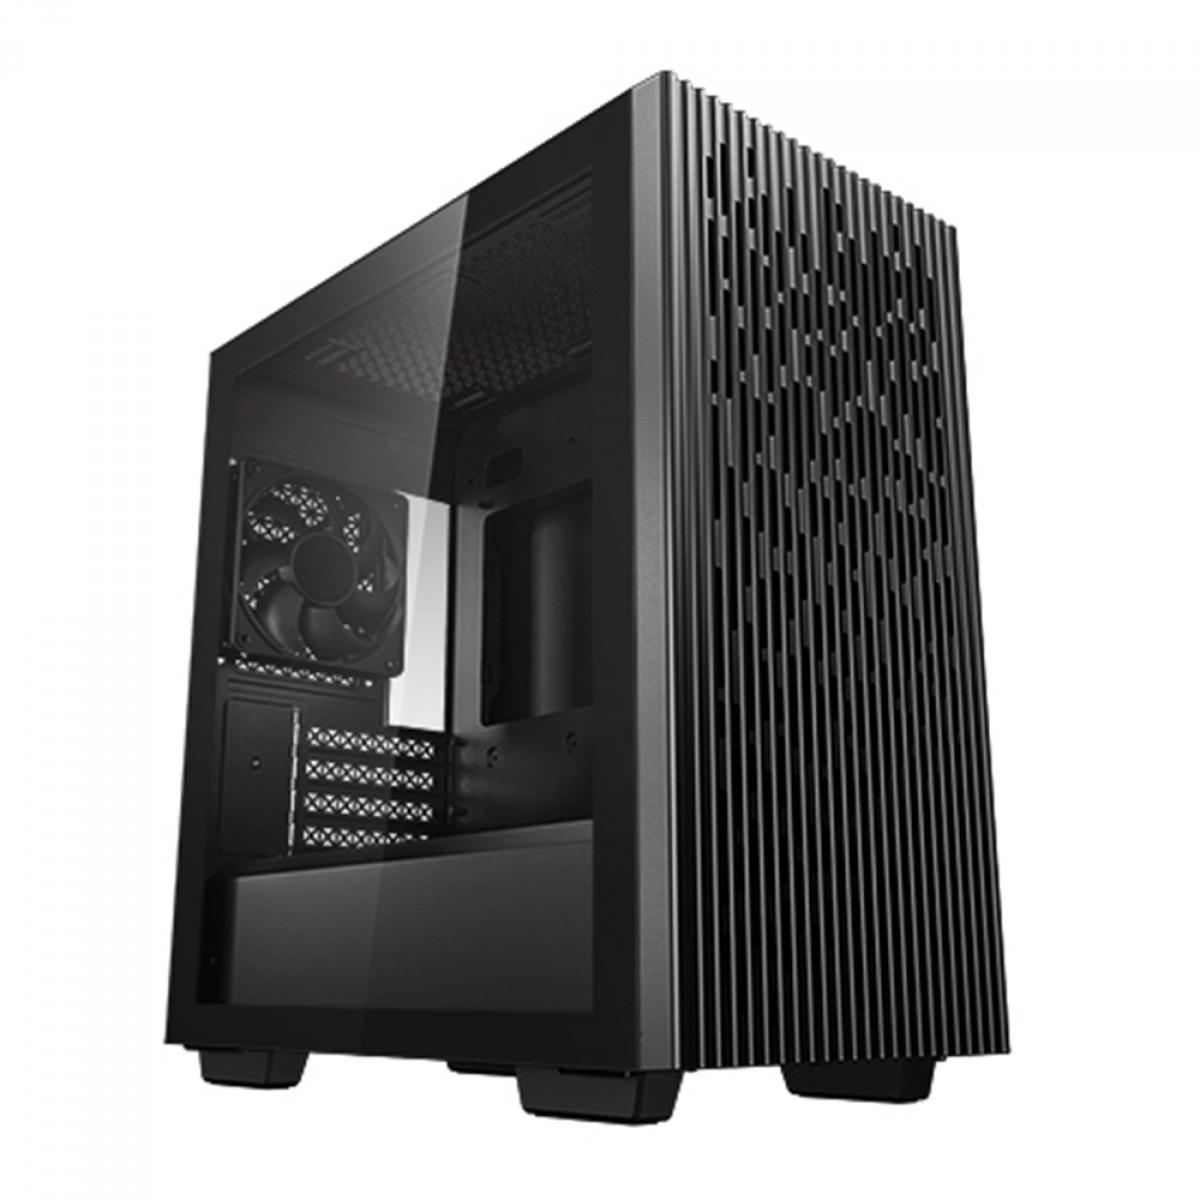 Gabinete Gamer DeepCool Matrexx 40, Mid Tower, Vidro Temperado, Black, Com 1 fan, Sem Fonte, DP-MATX-MATREXX40